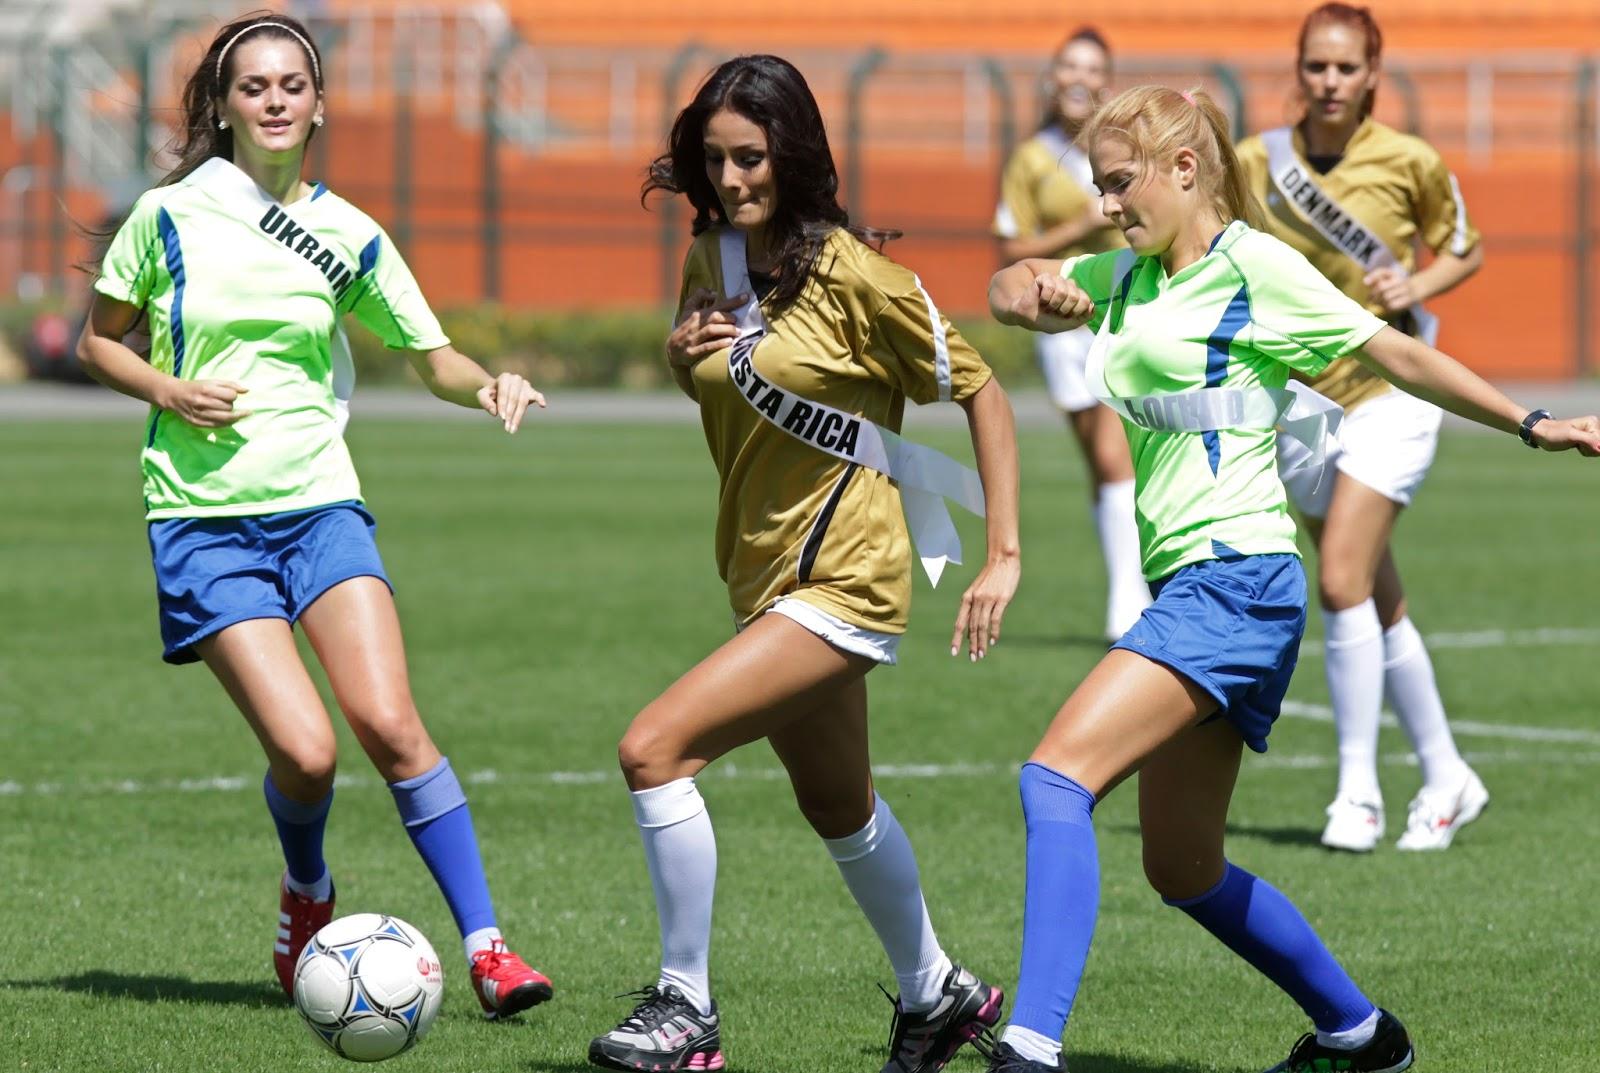 Futbol: Mujeres Jugando Futbol